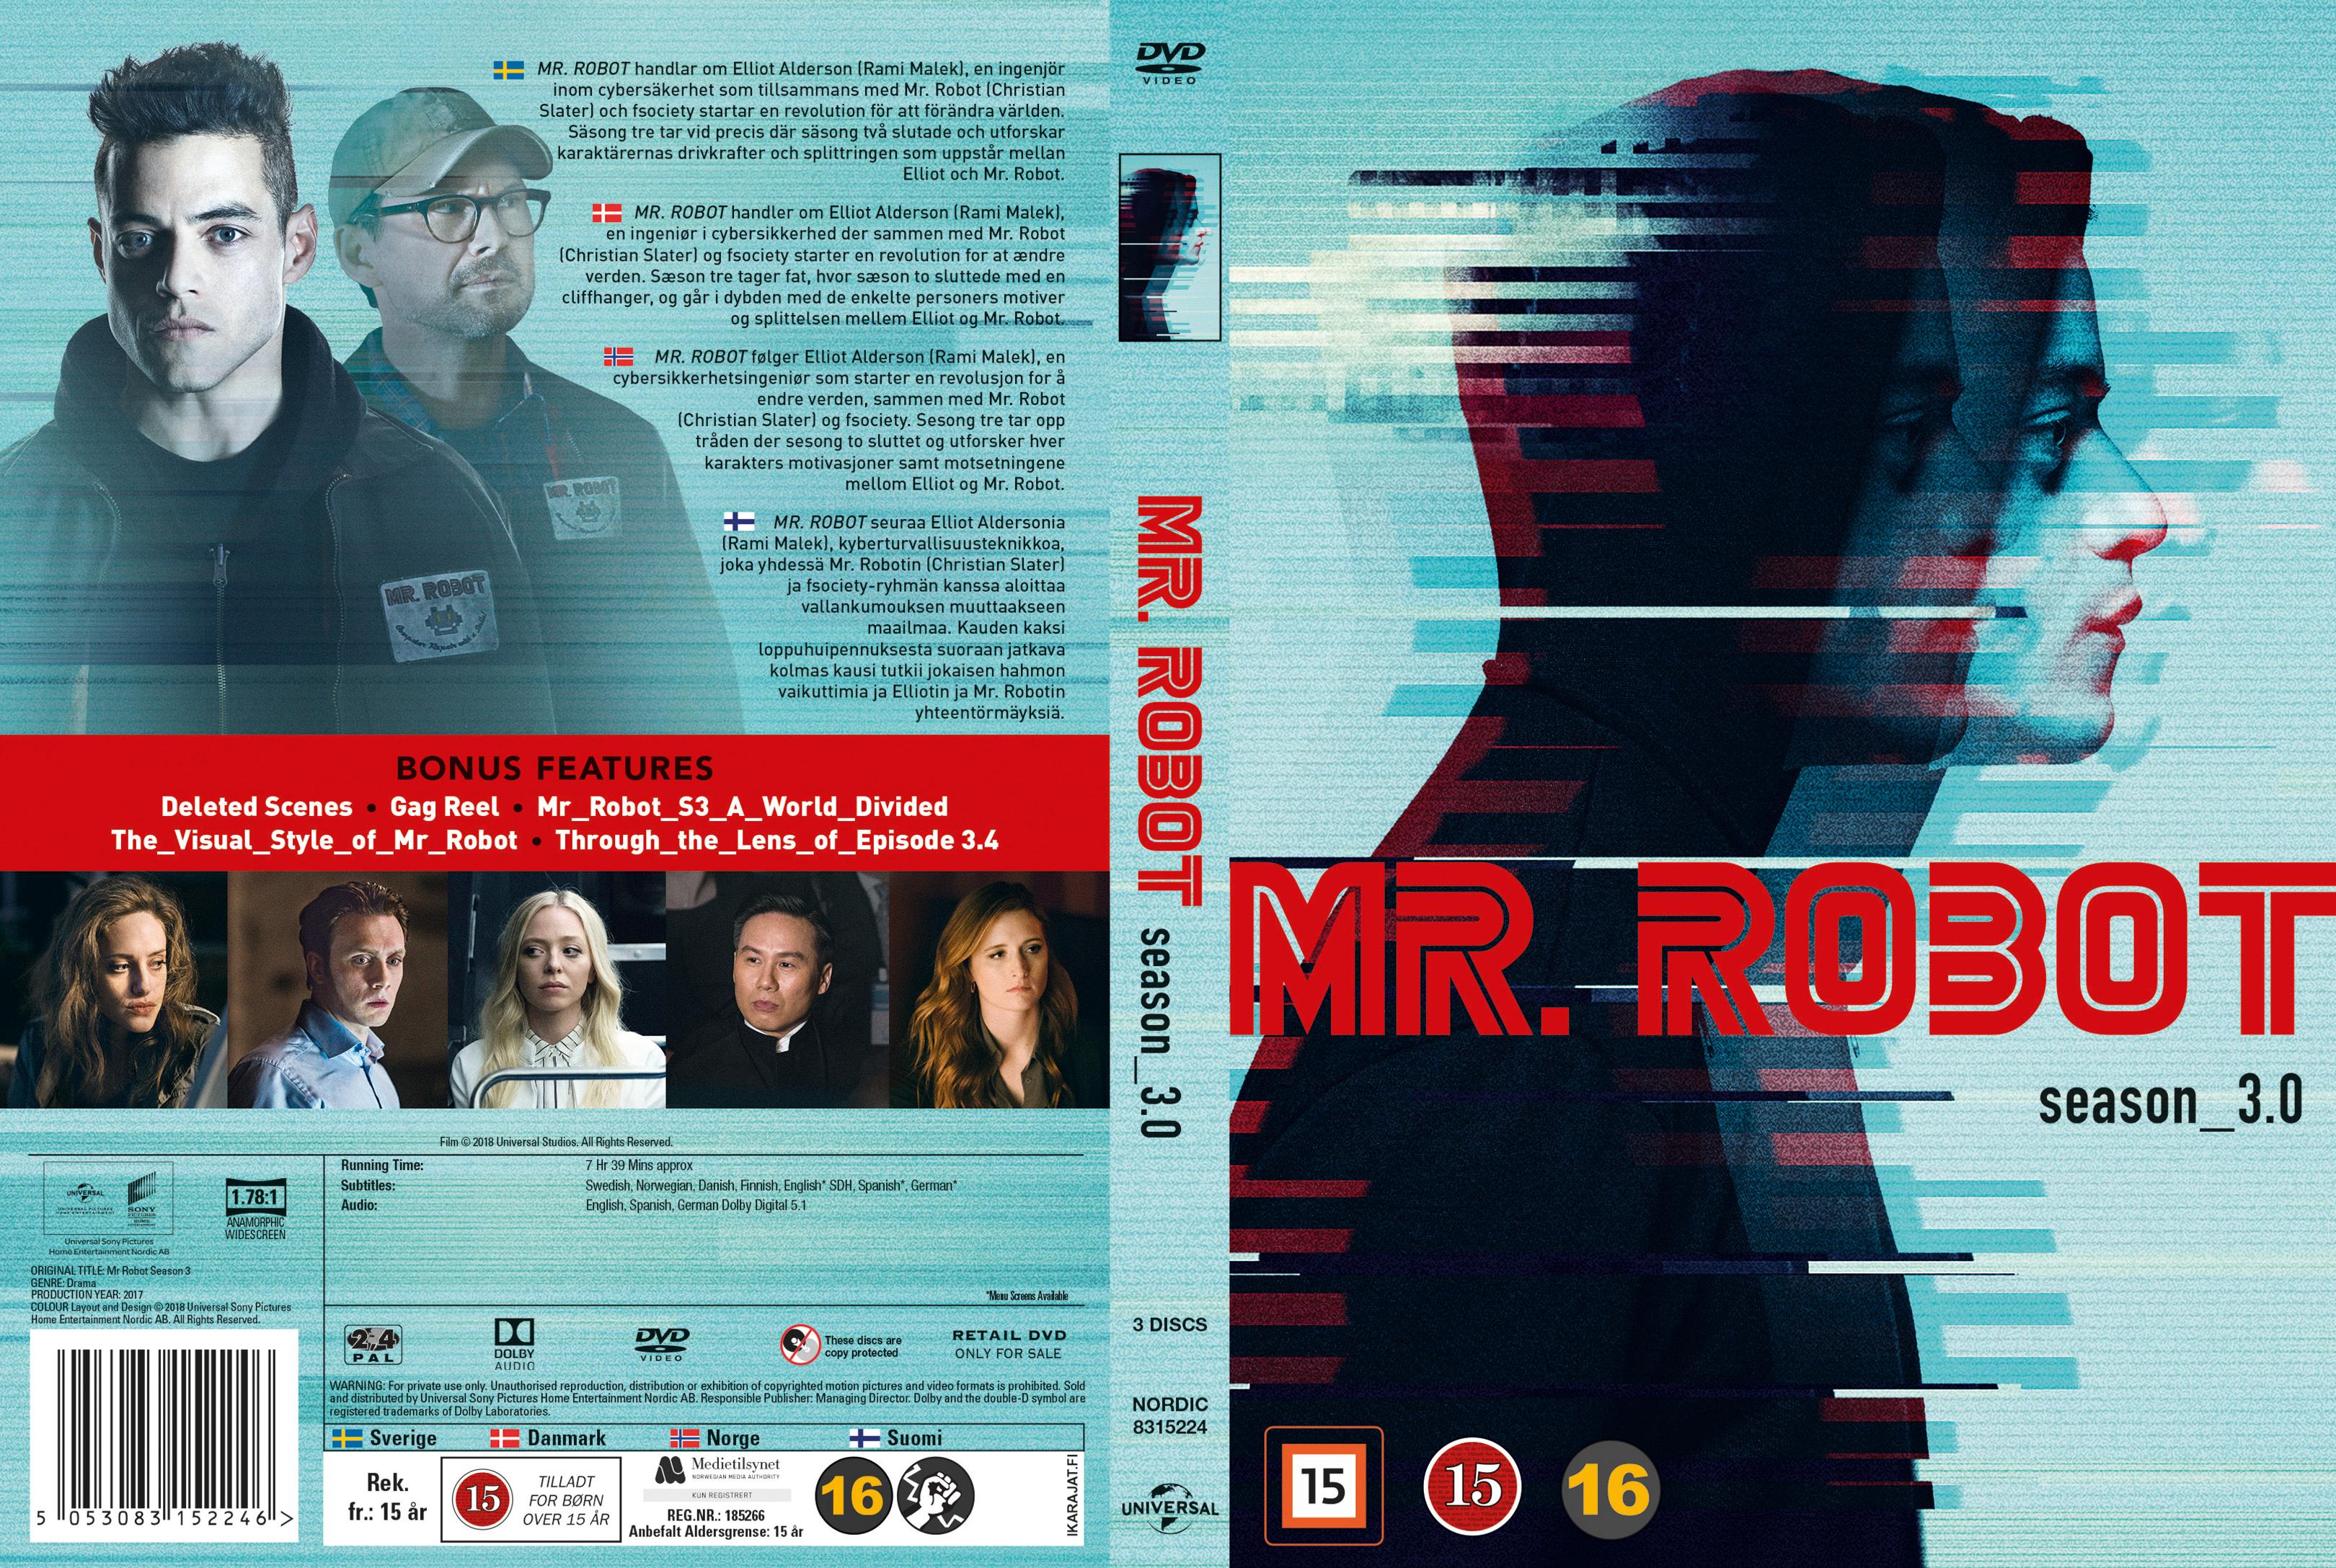 mr robot download season 1